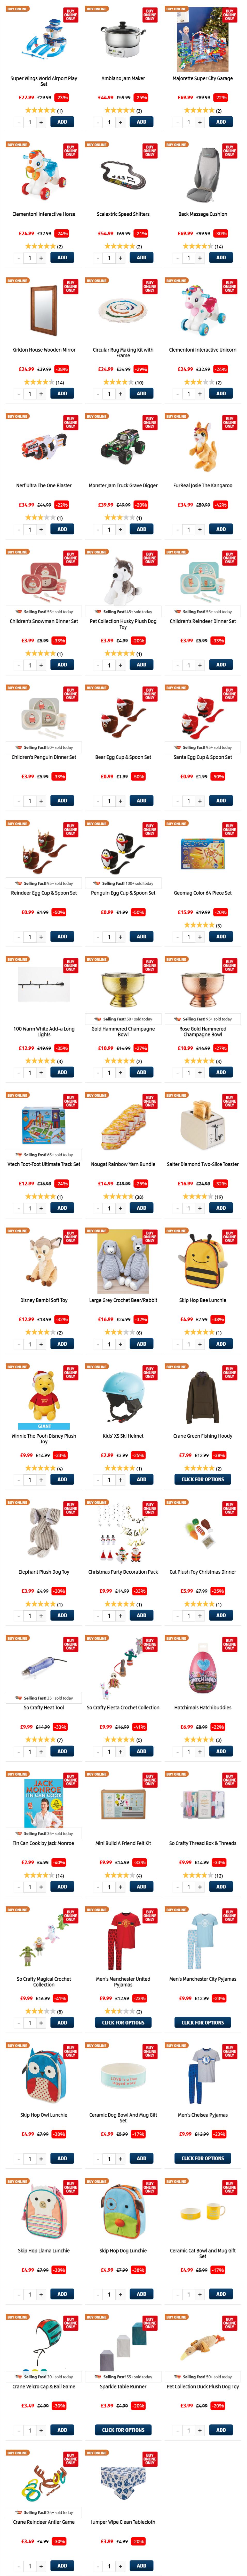 ALDI Online Winter Sale 2020